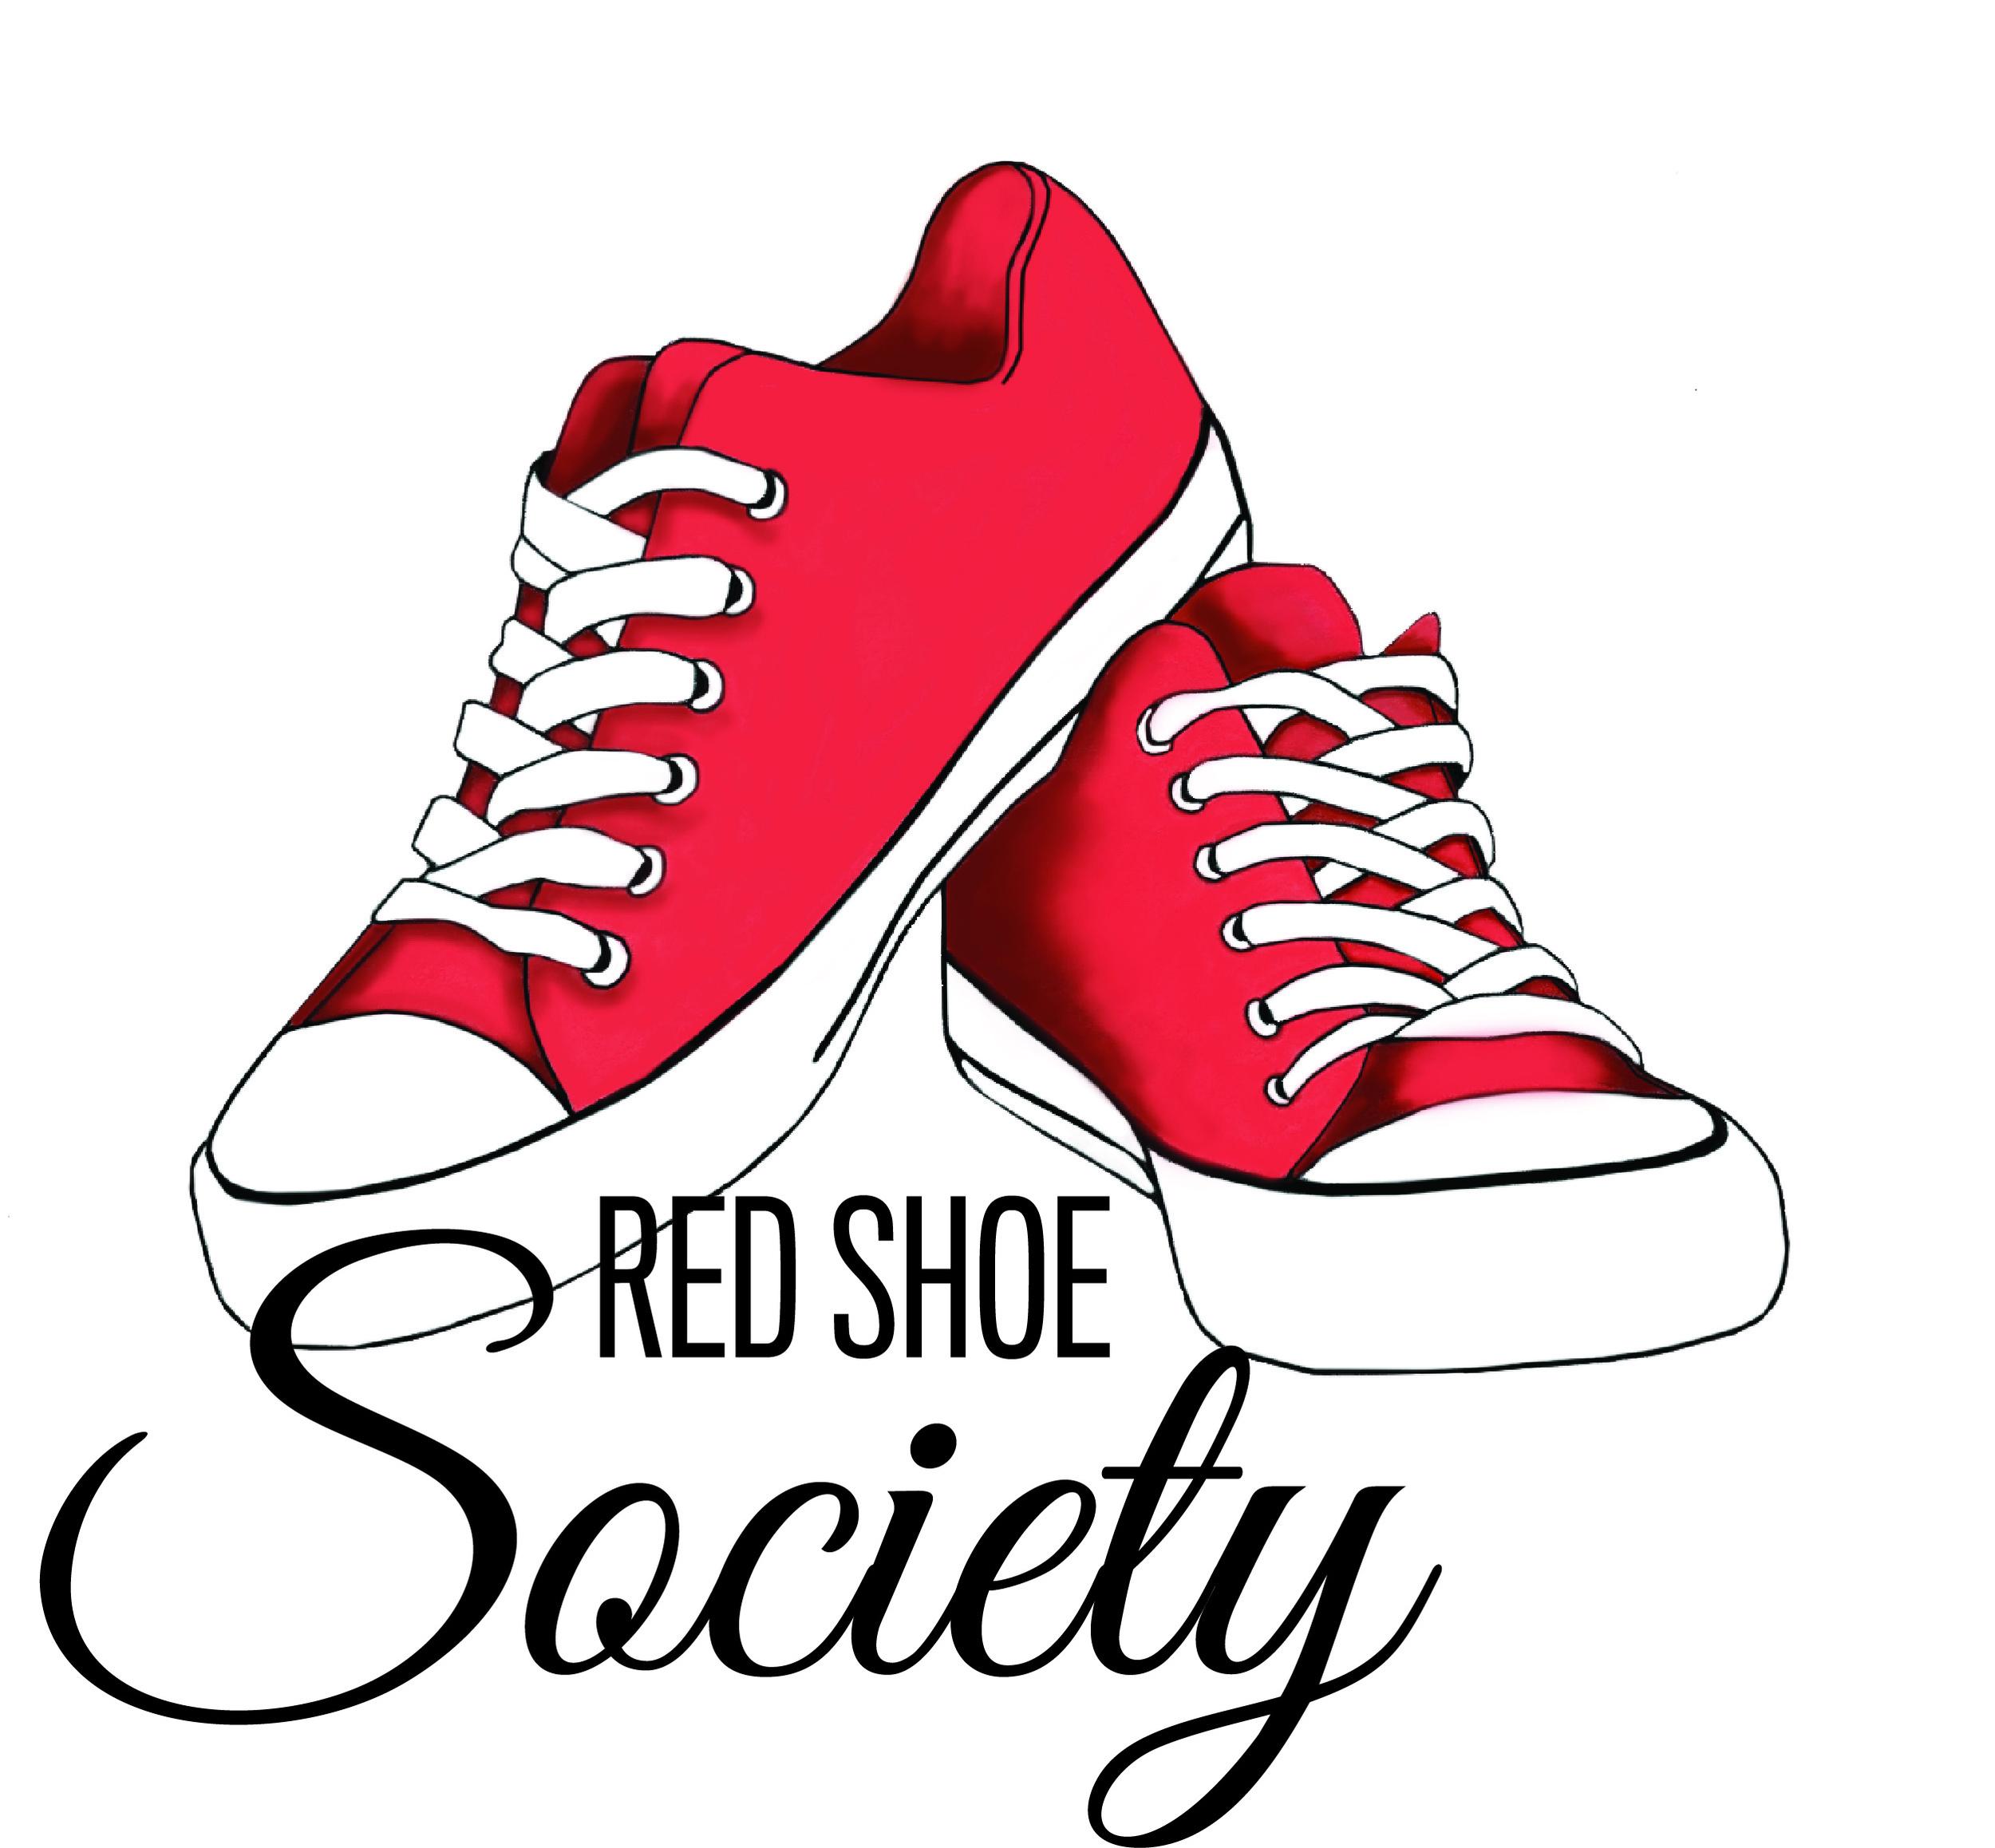 RedShoeSociety_Final.jpg